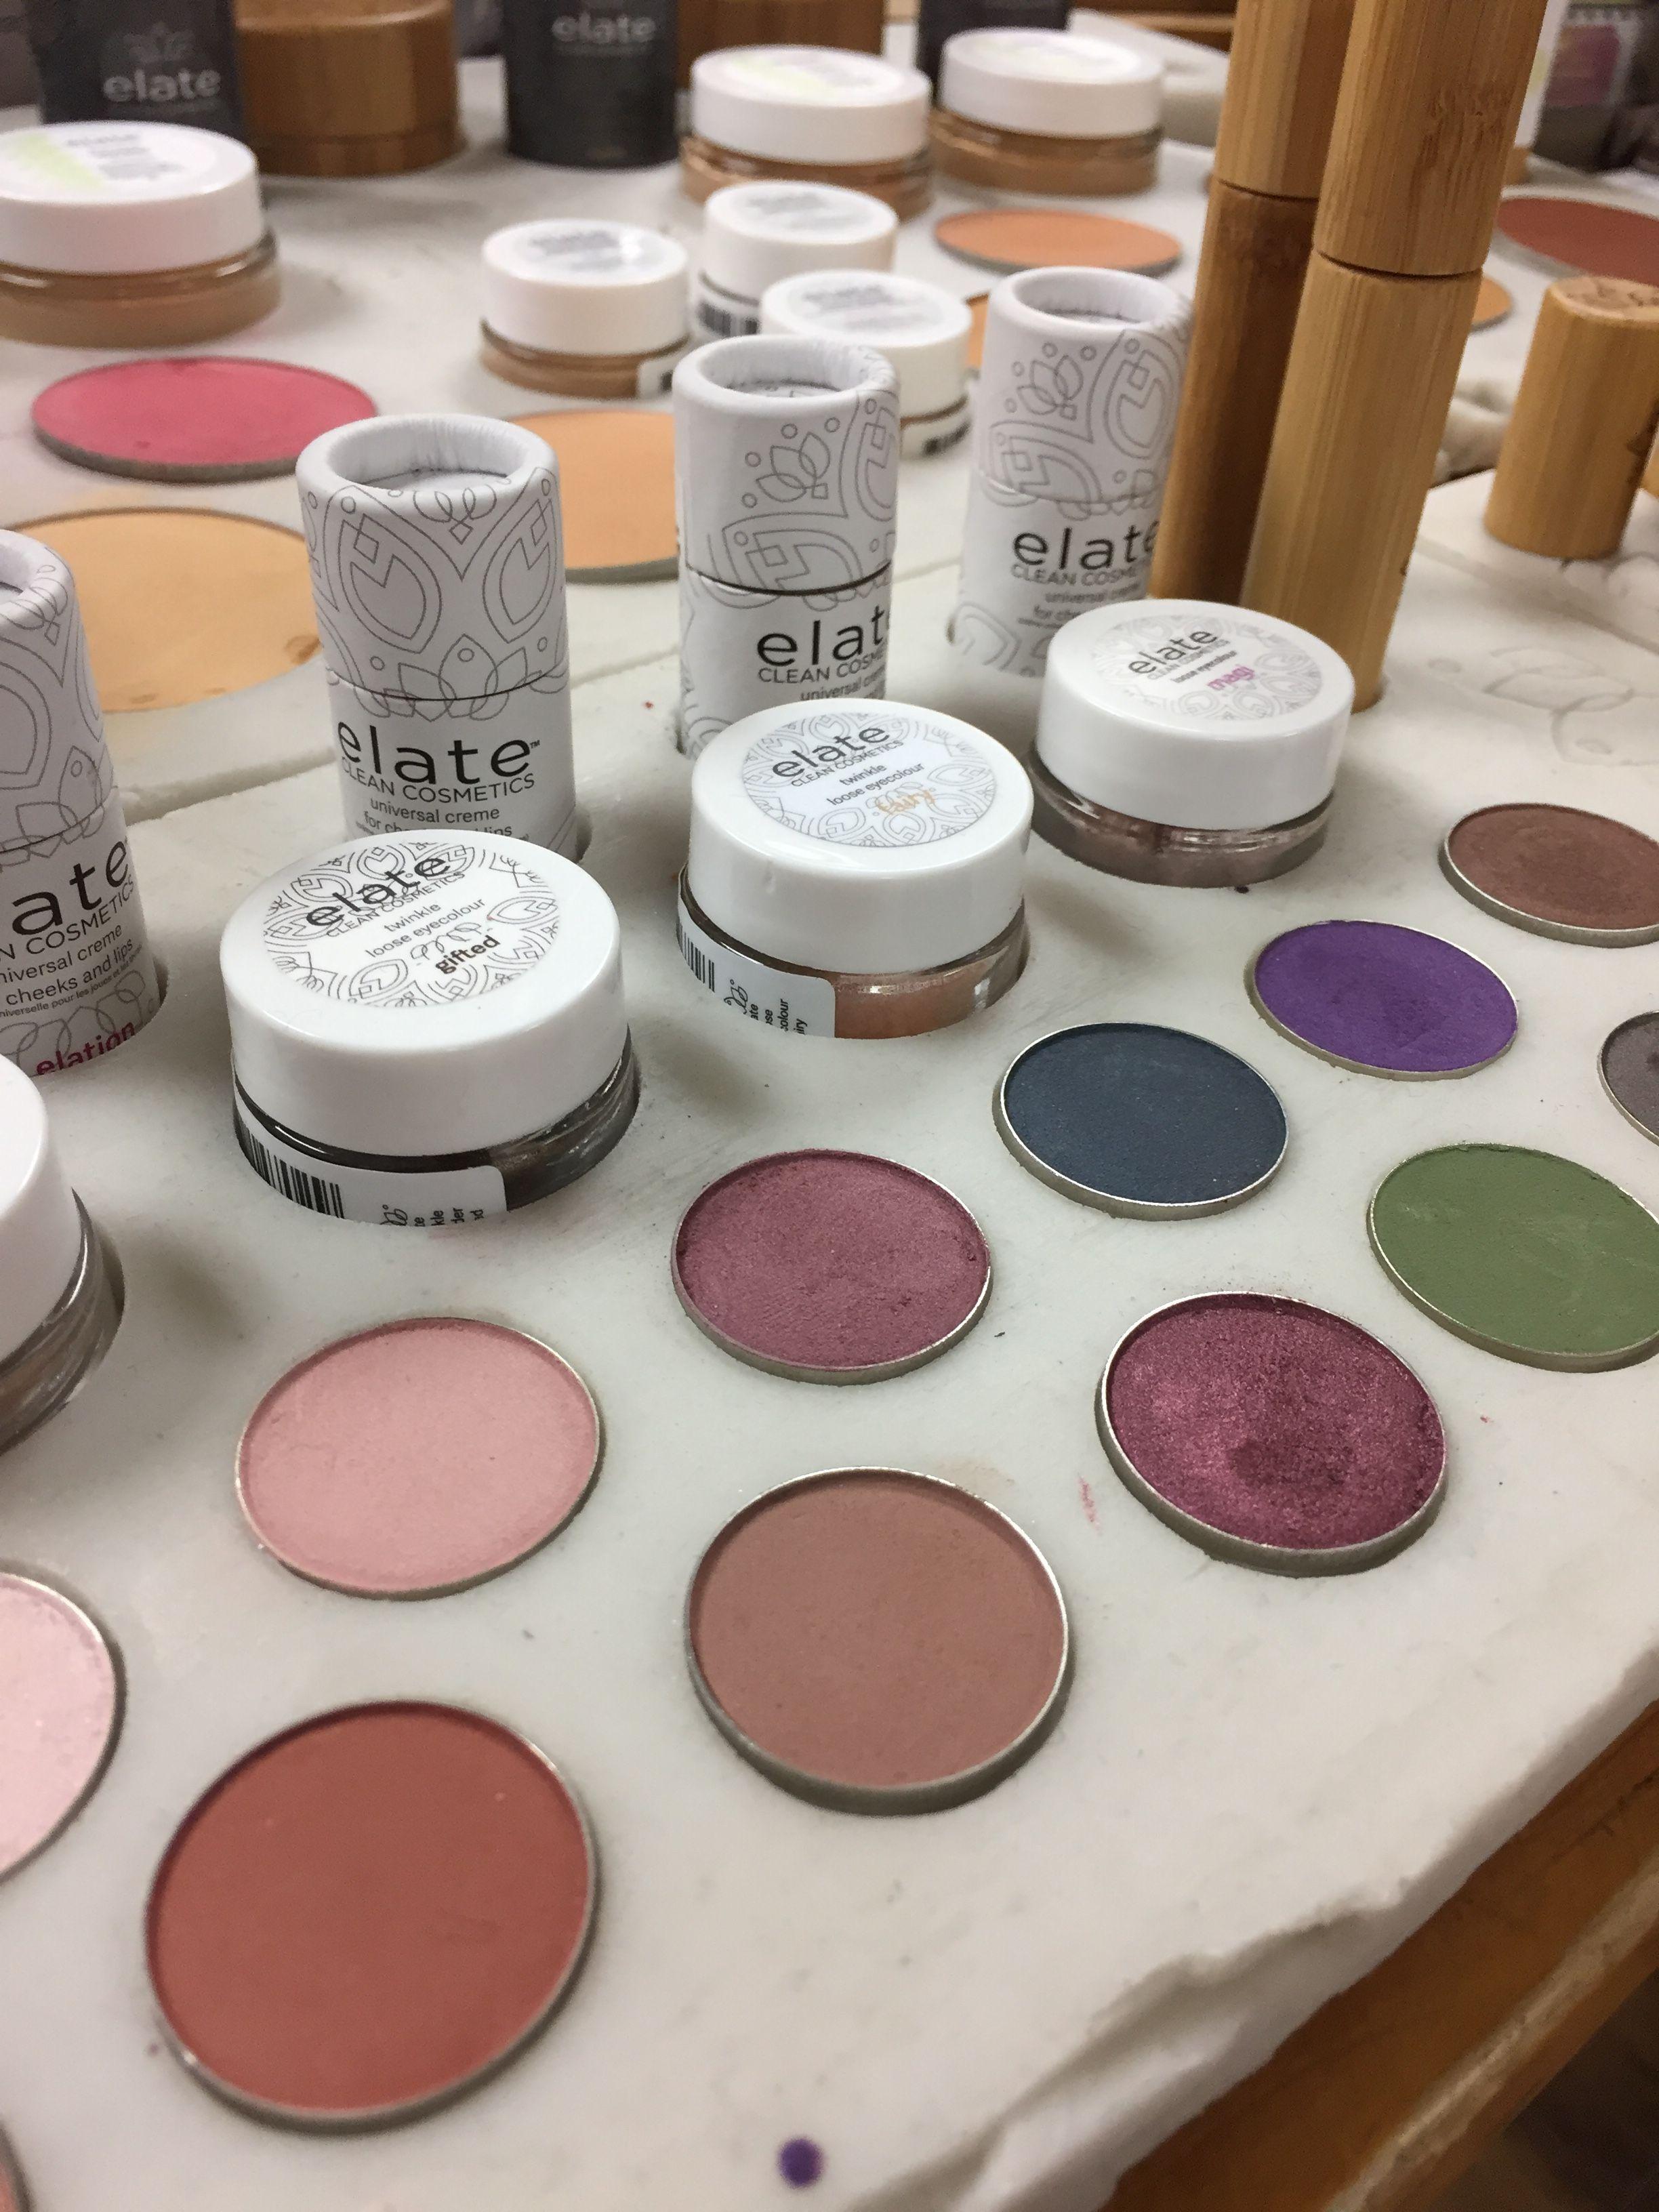 Elate cosmetics eye shadows. Elate cosmetics, Clean